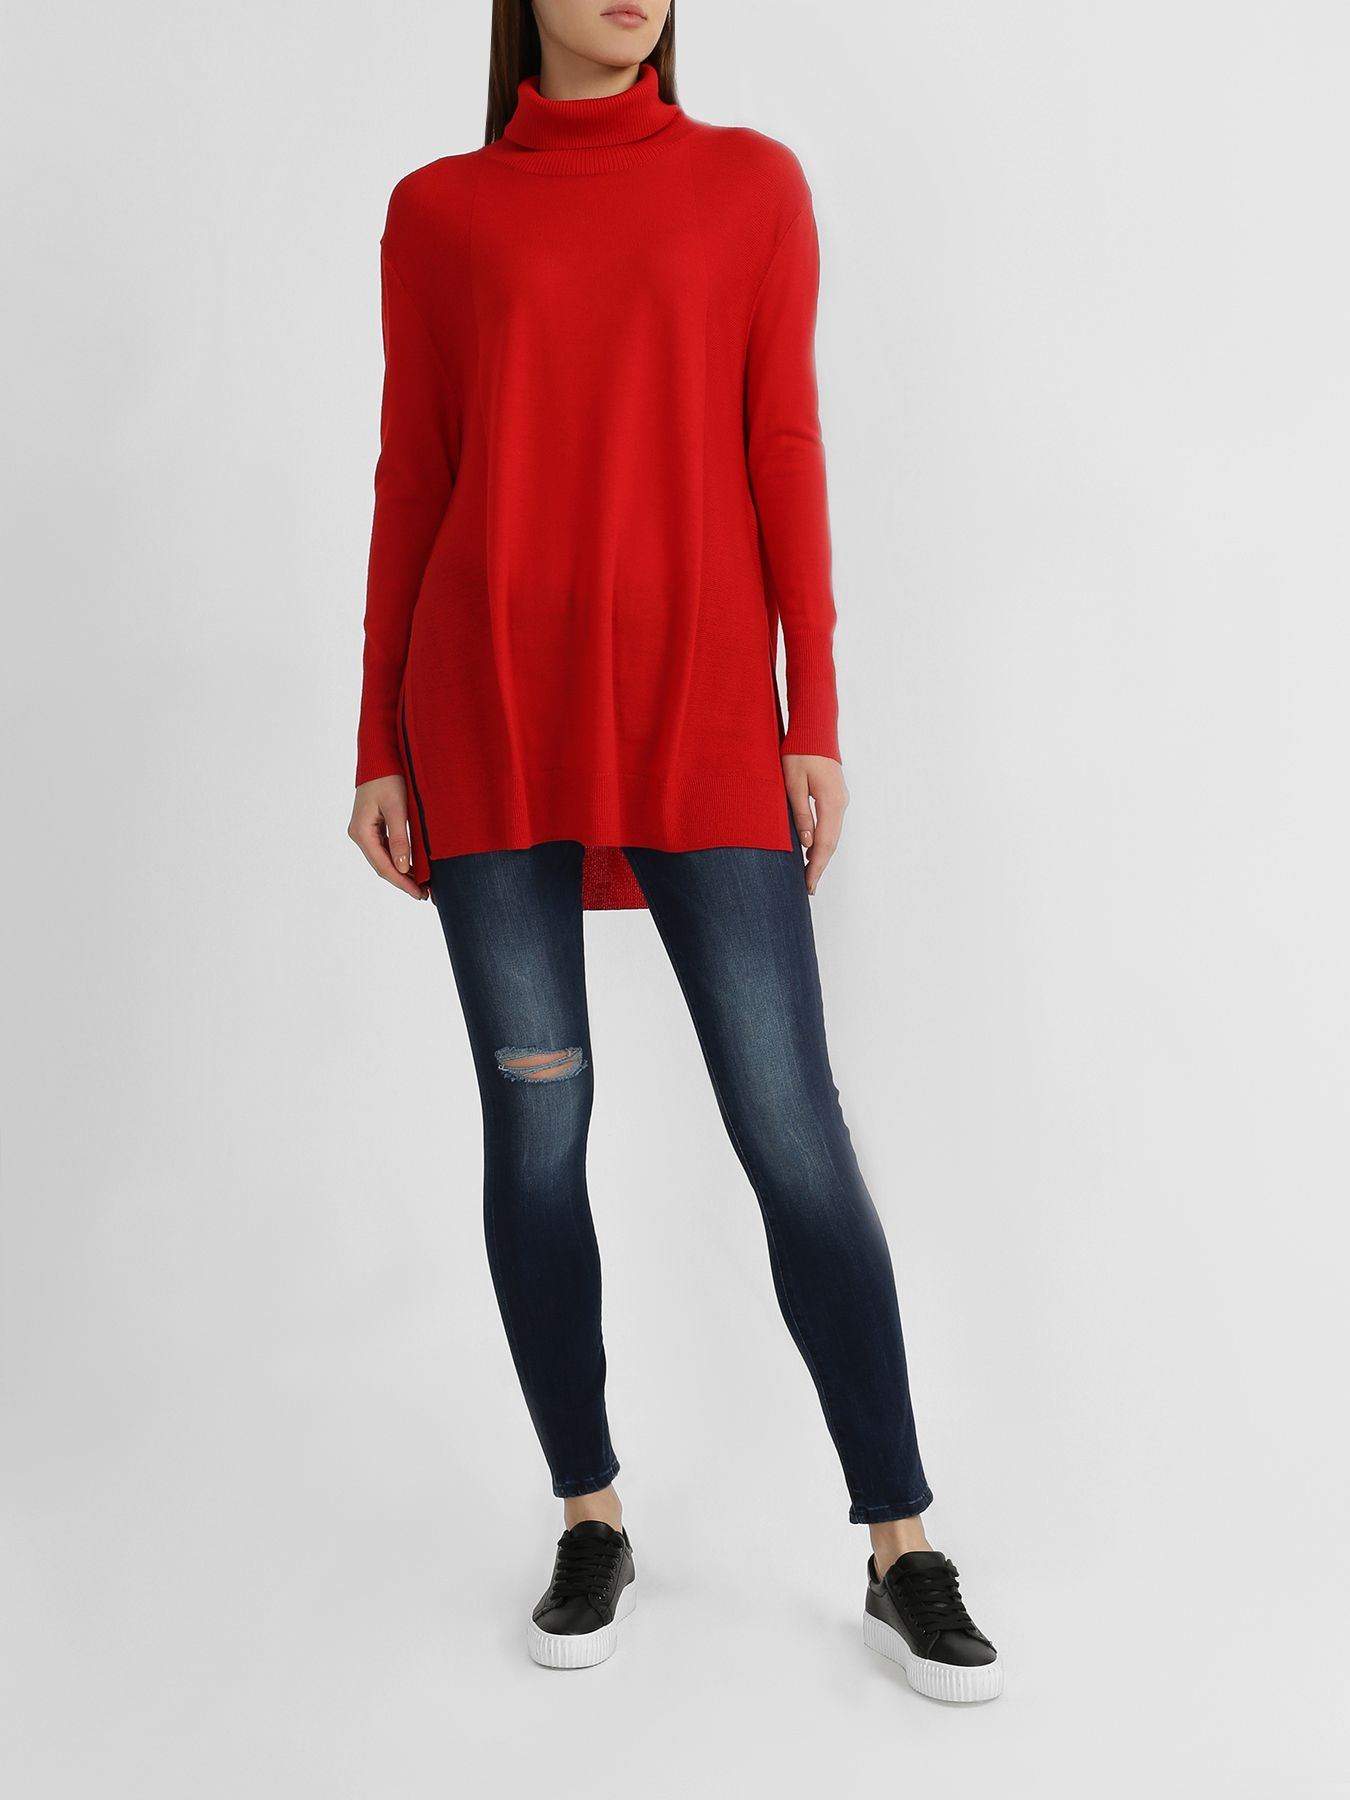 Woolrich Удлиненный свитер 326334-043